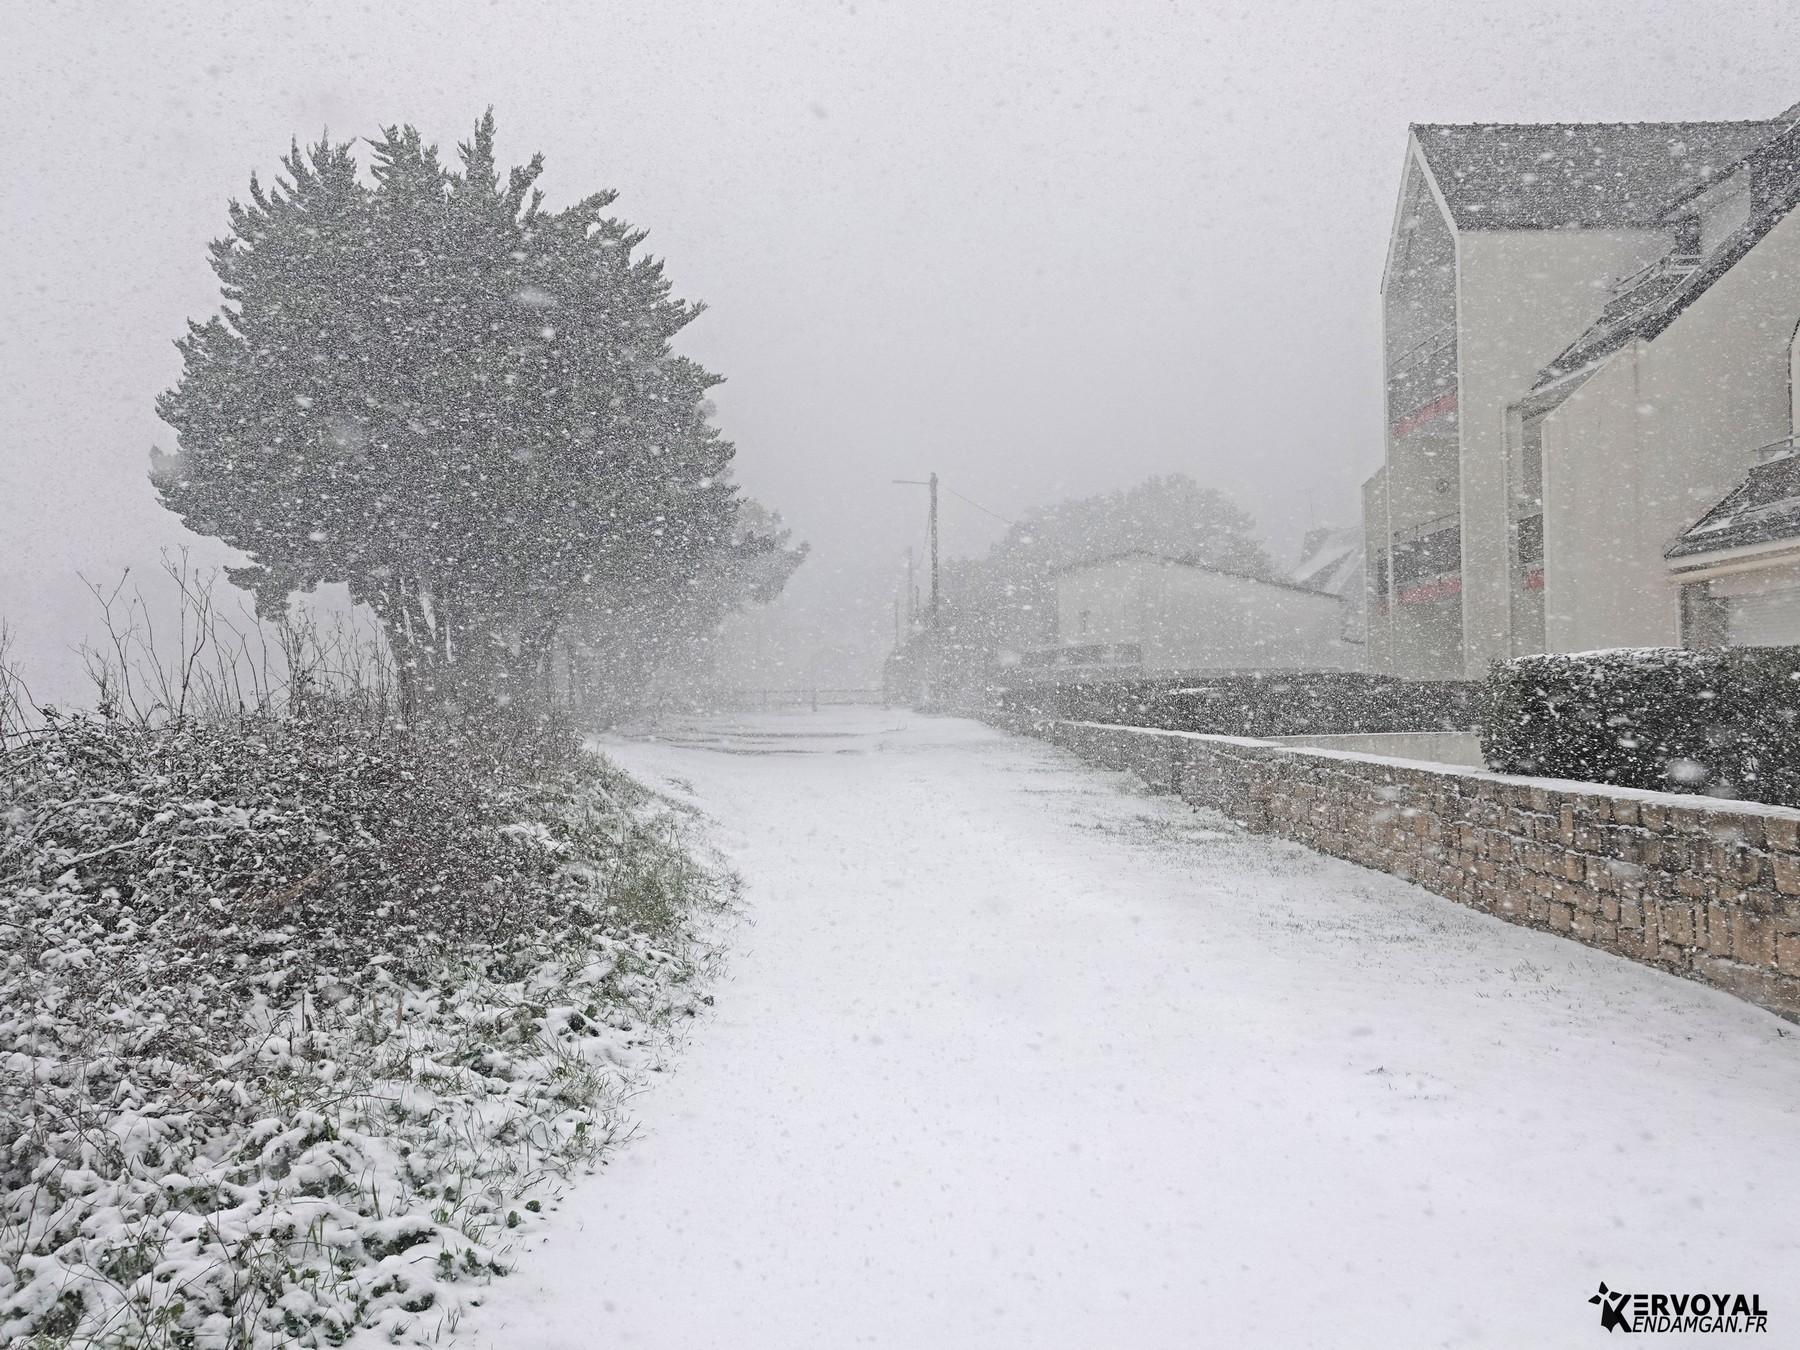 neige à kervoyal 11 février 2021 damgan morbihan (24)